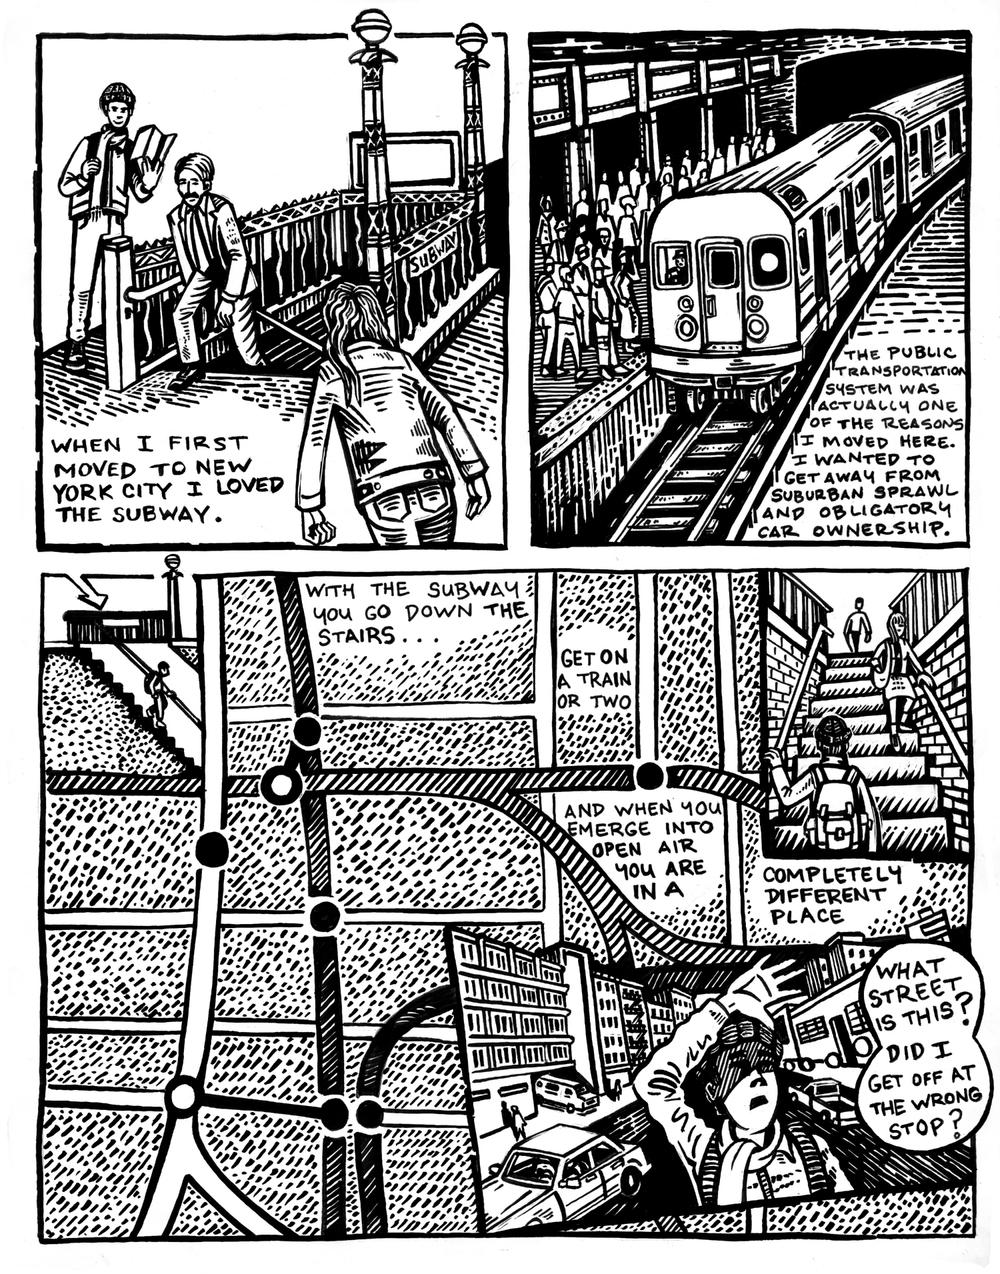 rtl.subway1.jpg